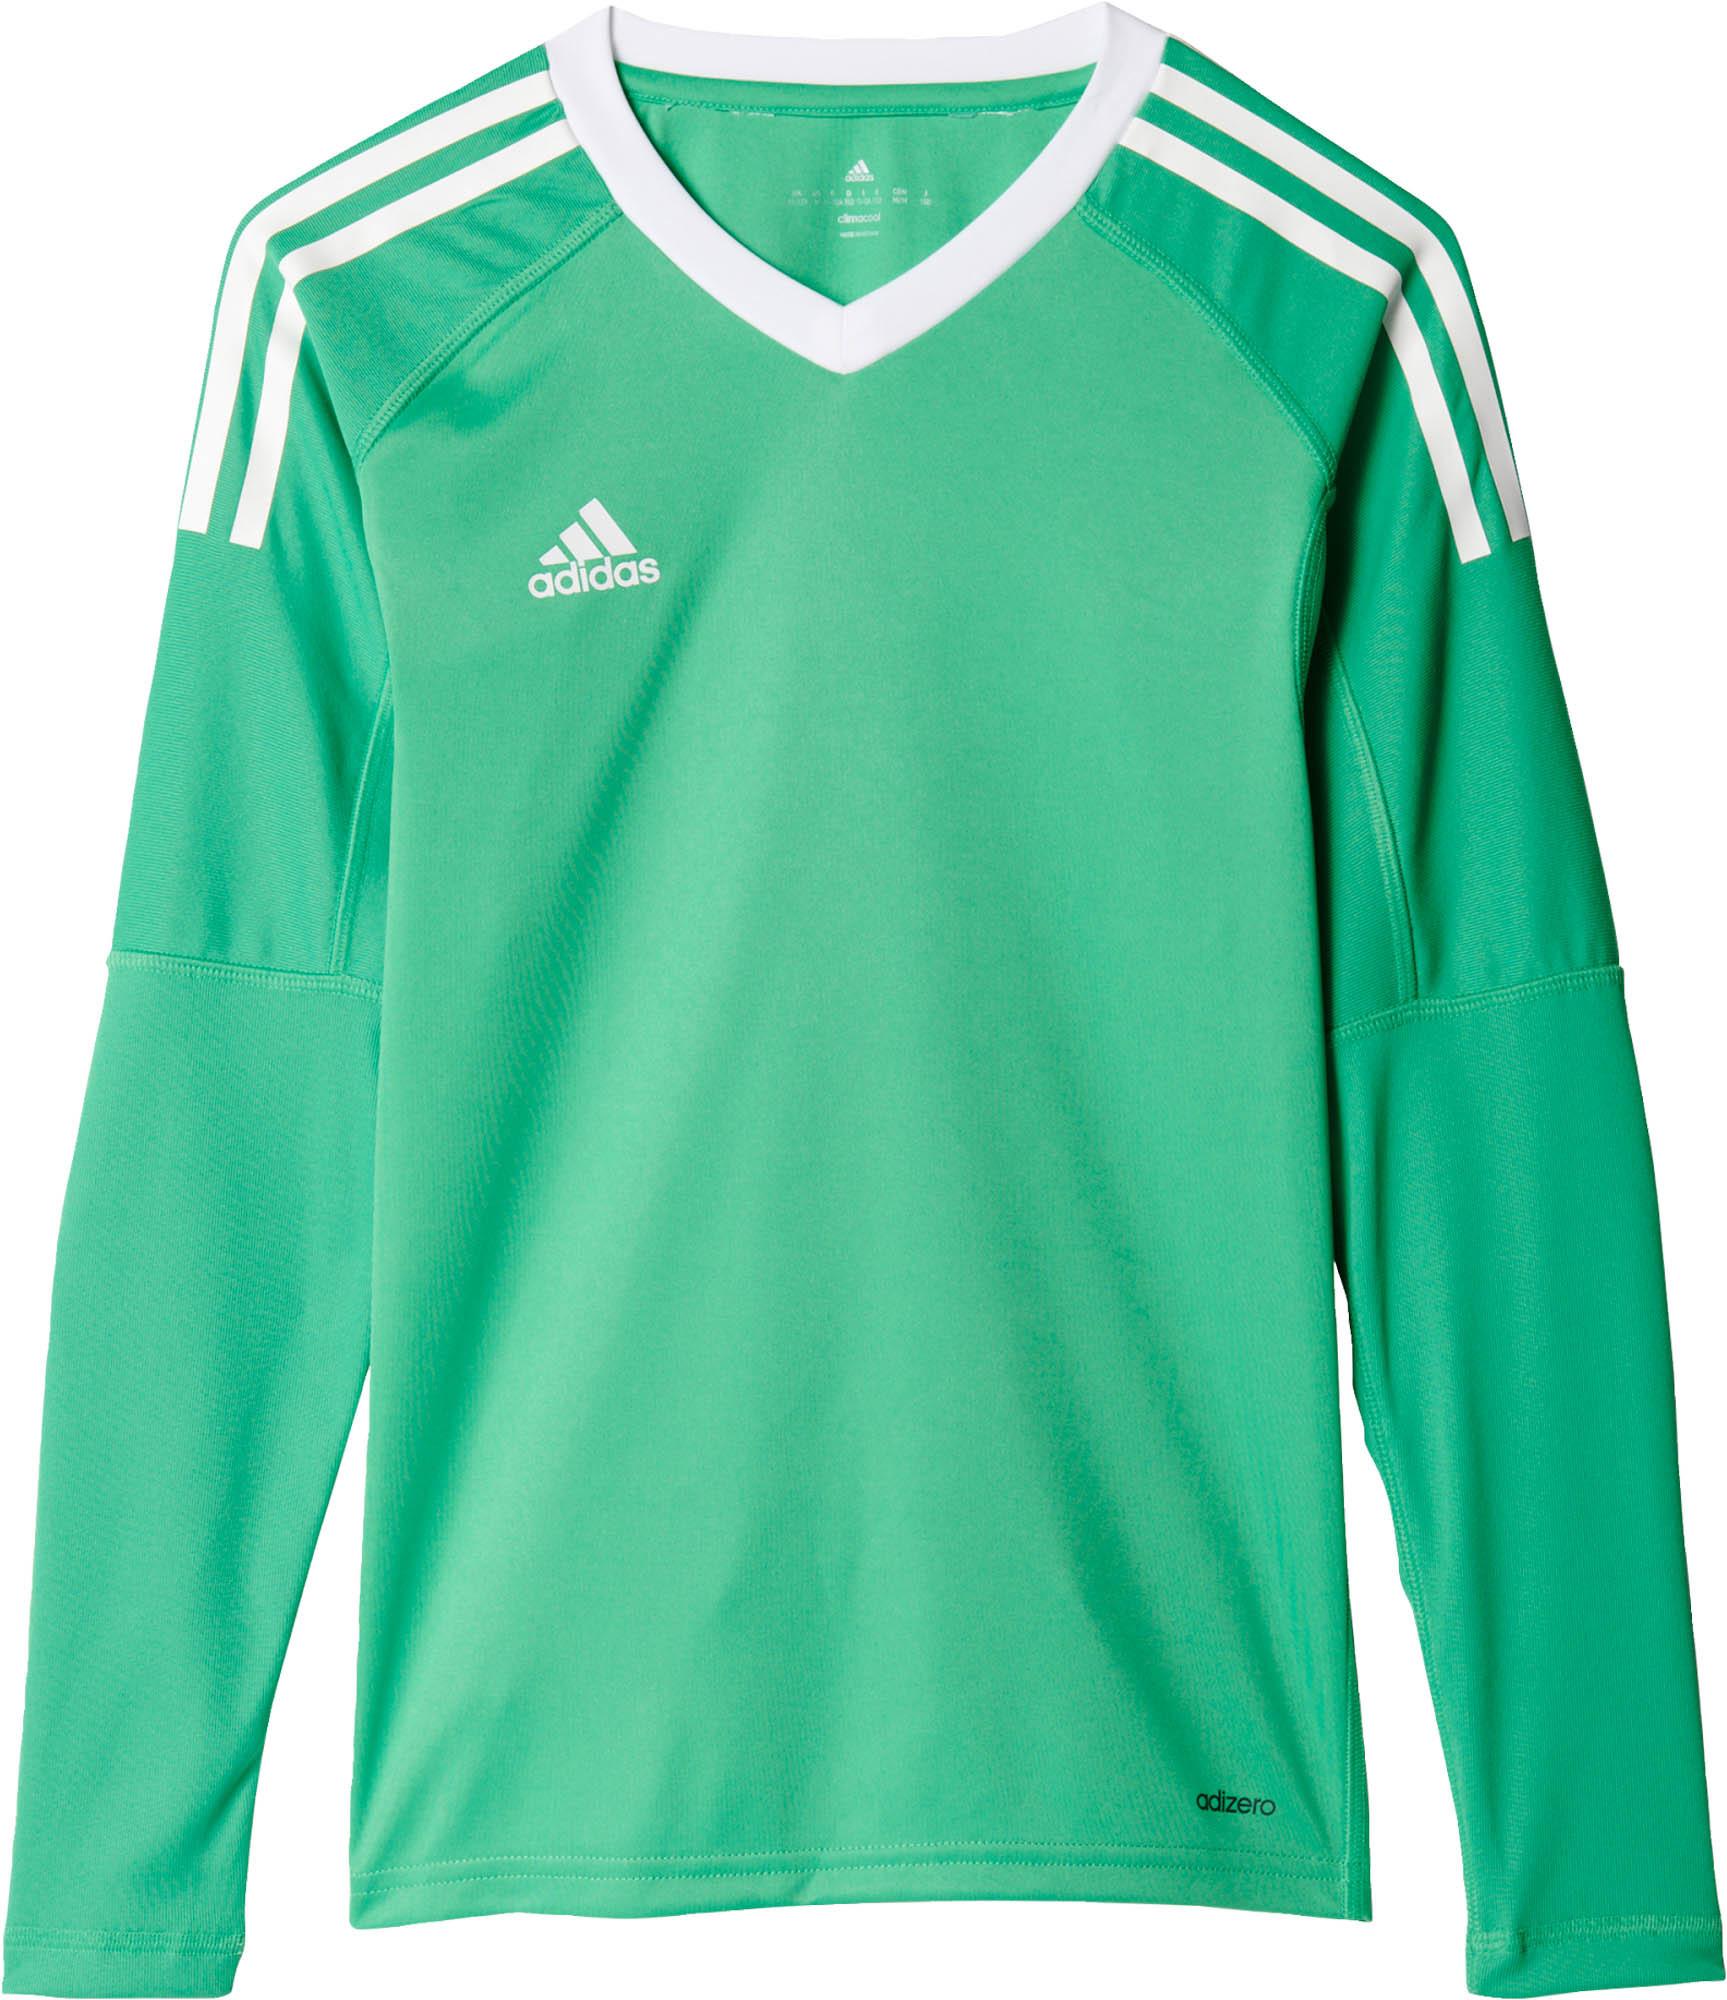 adidas Kids Revigo 17 Goalkeeper Jersey - Energy Green & White ...